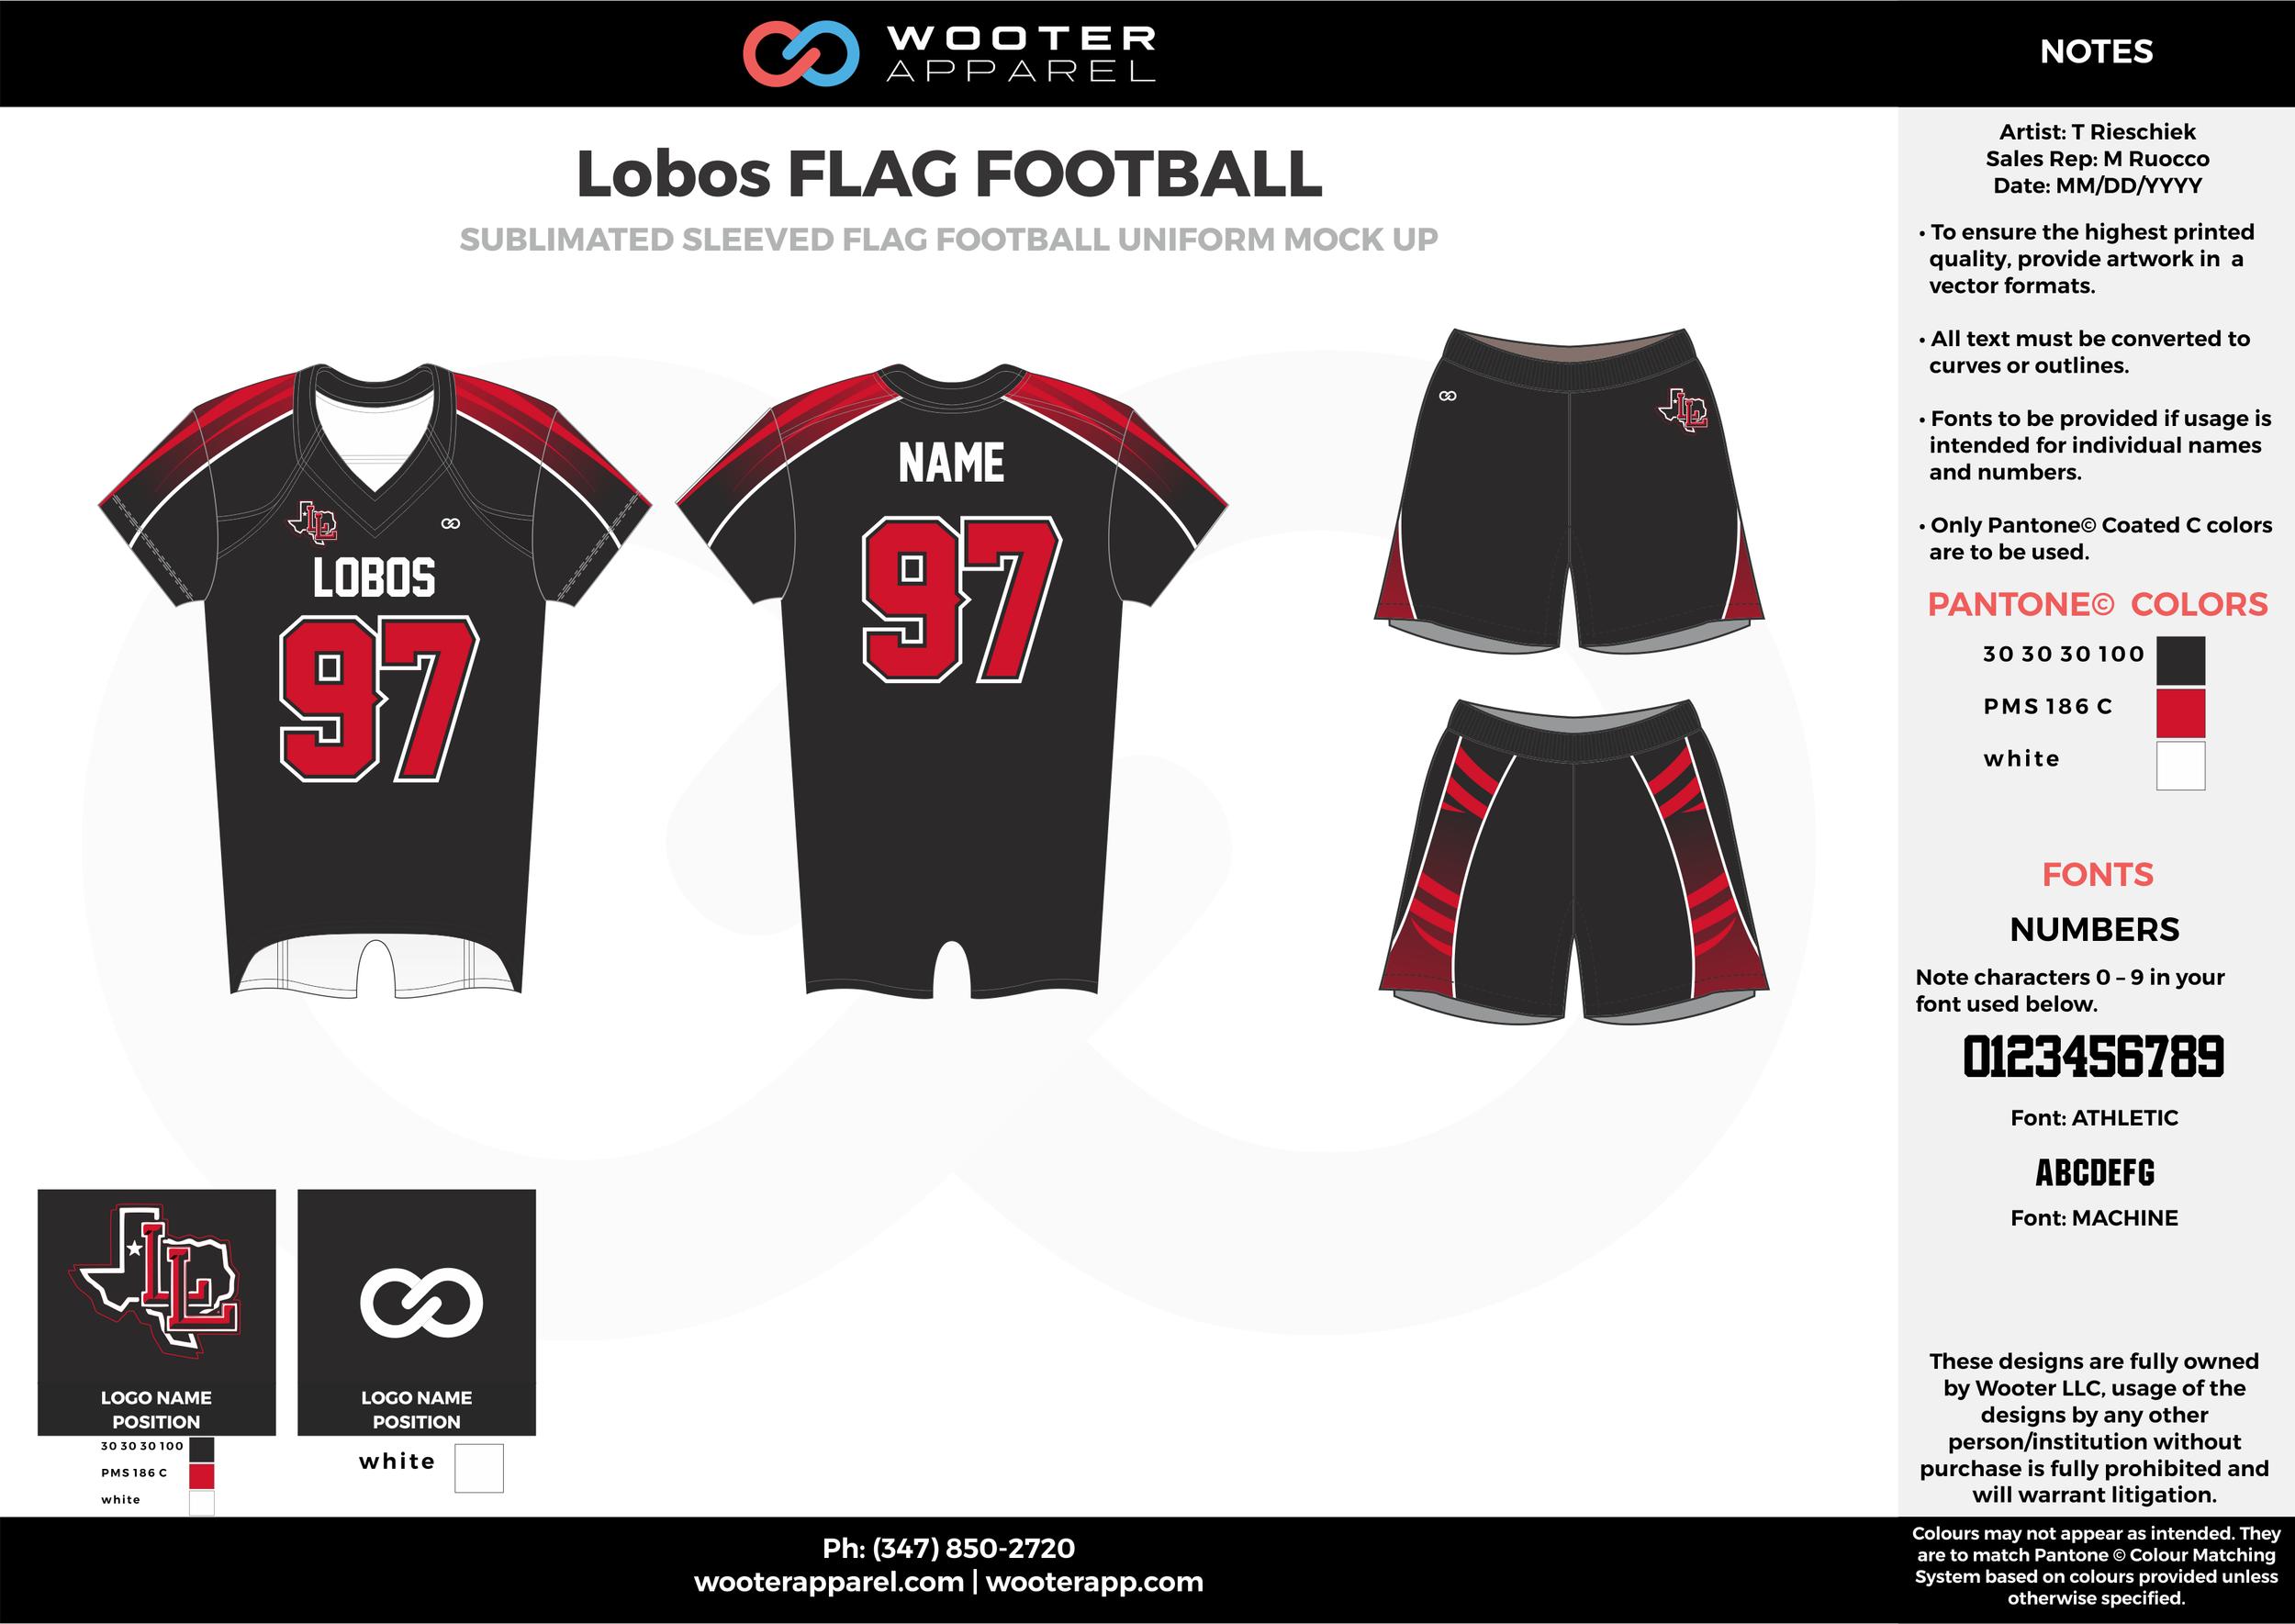 LOBOS Flag Football black red white flag football uniforms jerseys shorts